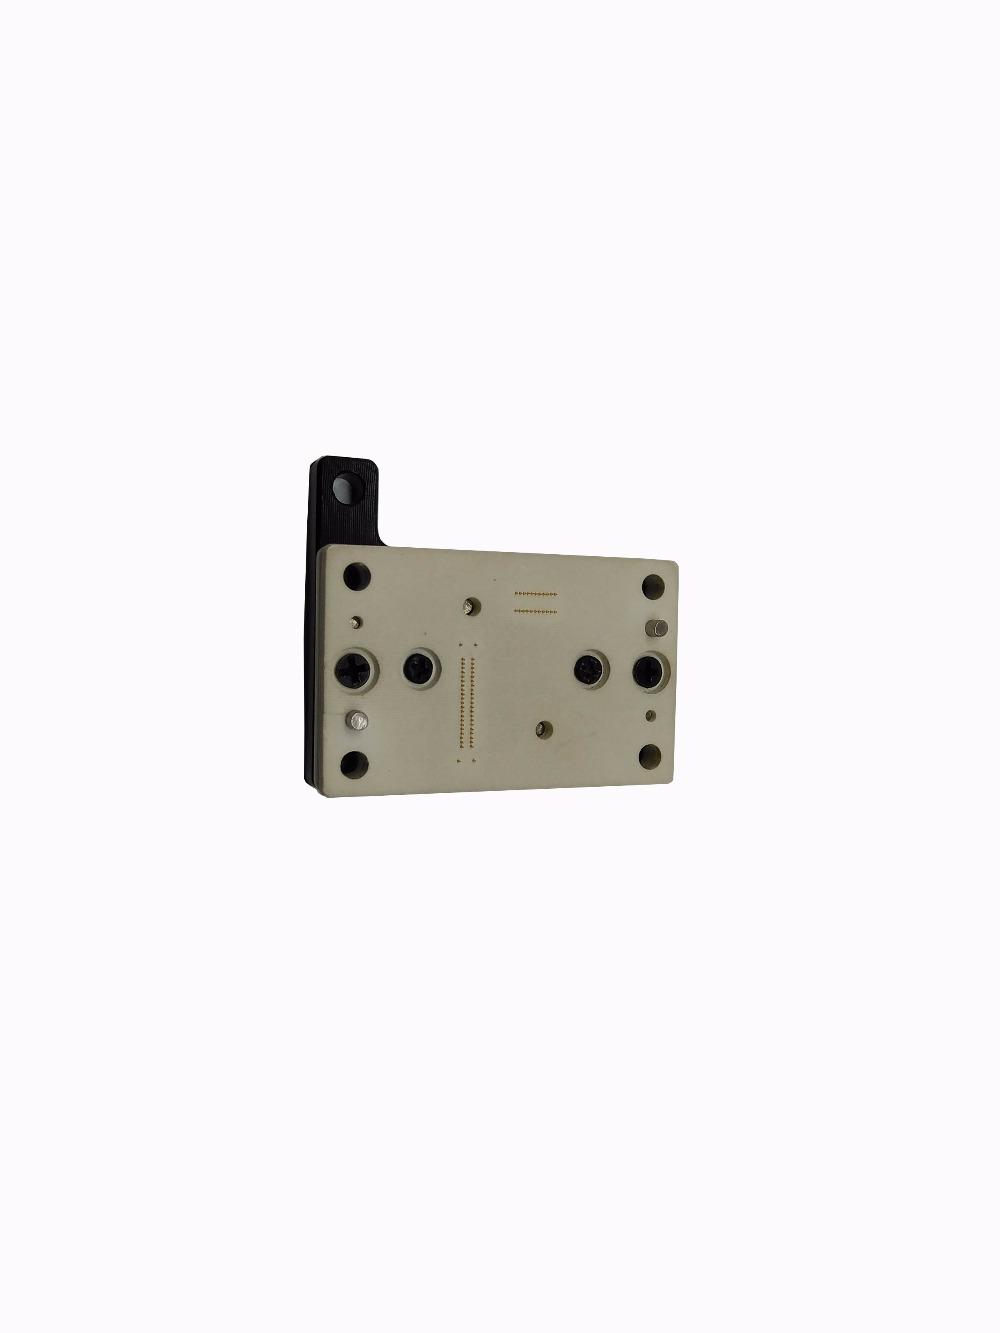 7LCD+TP+Cennector (7)